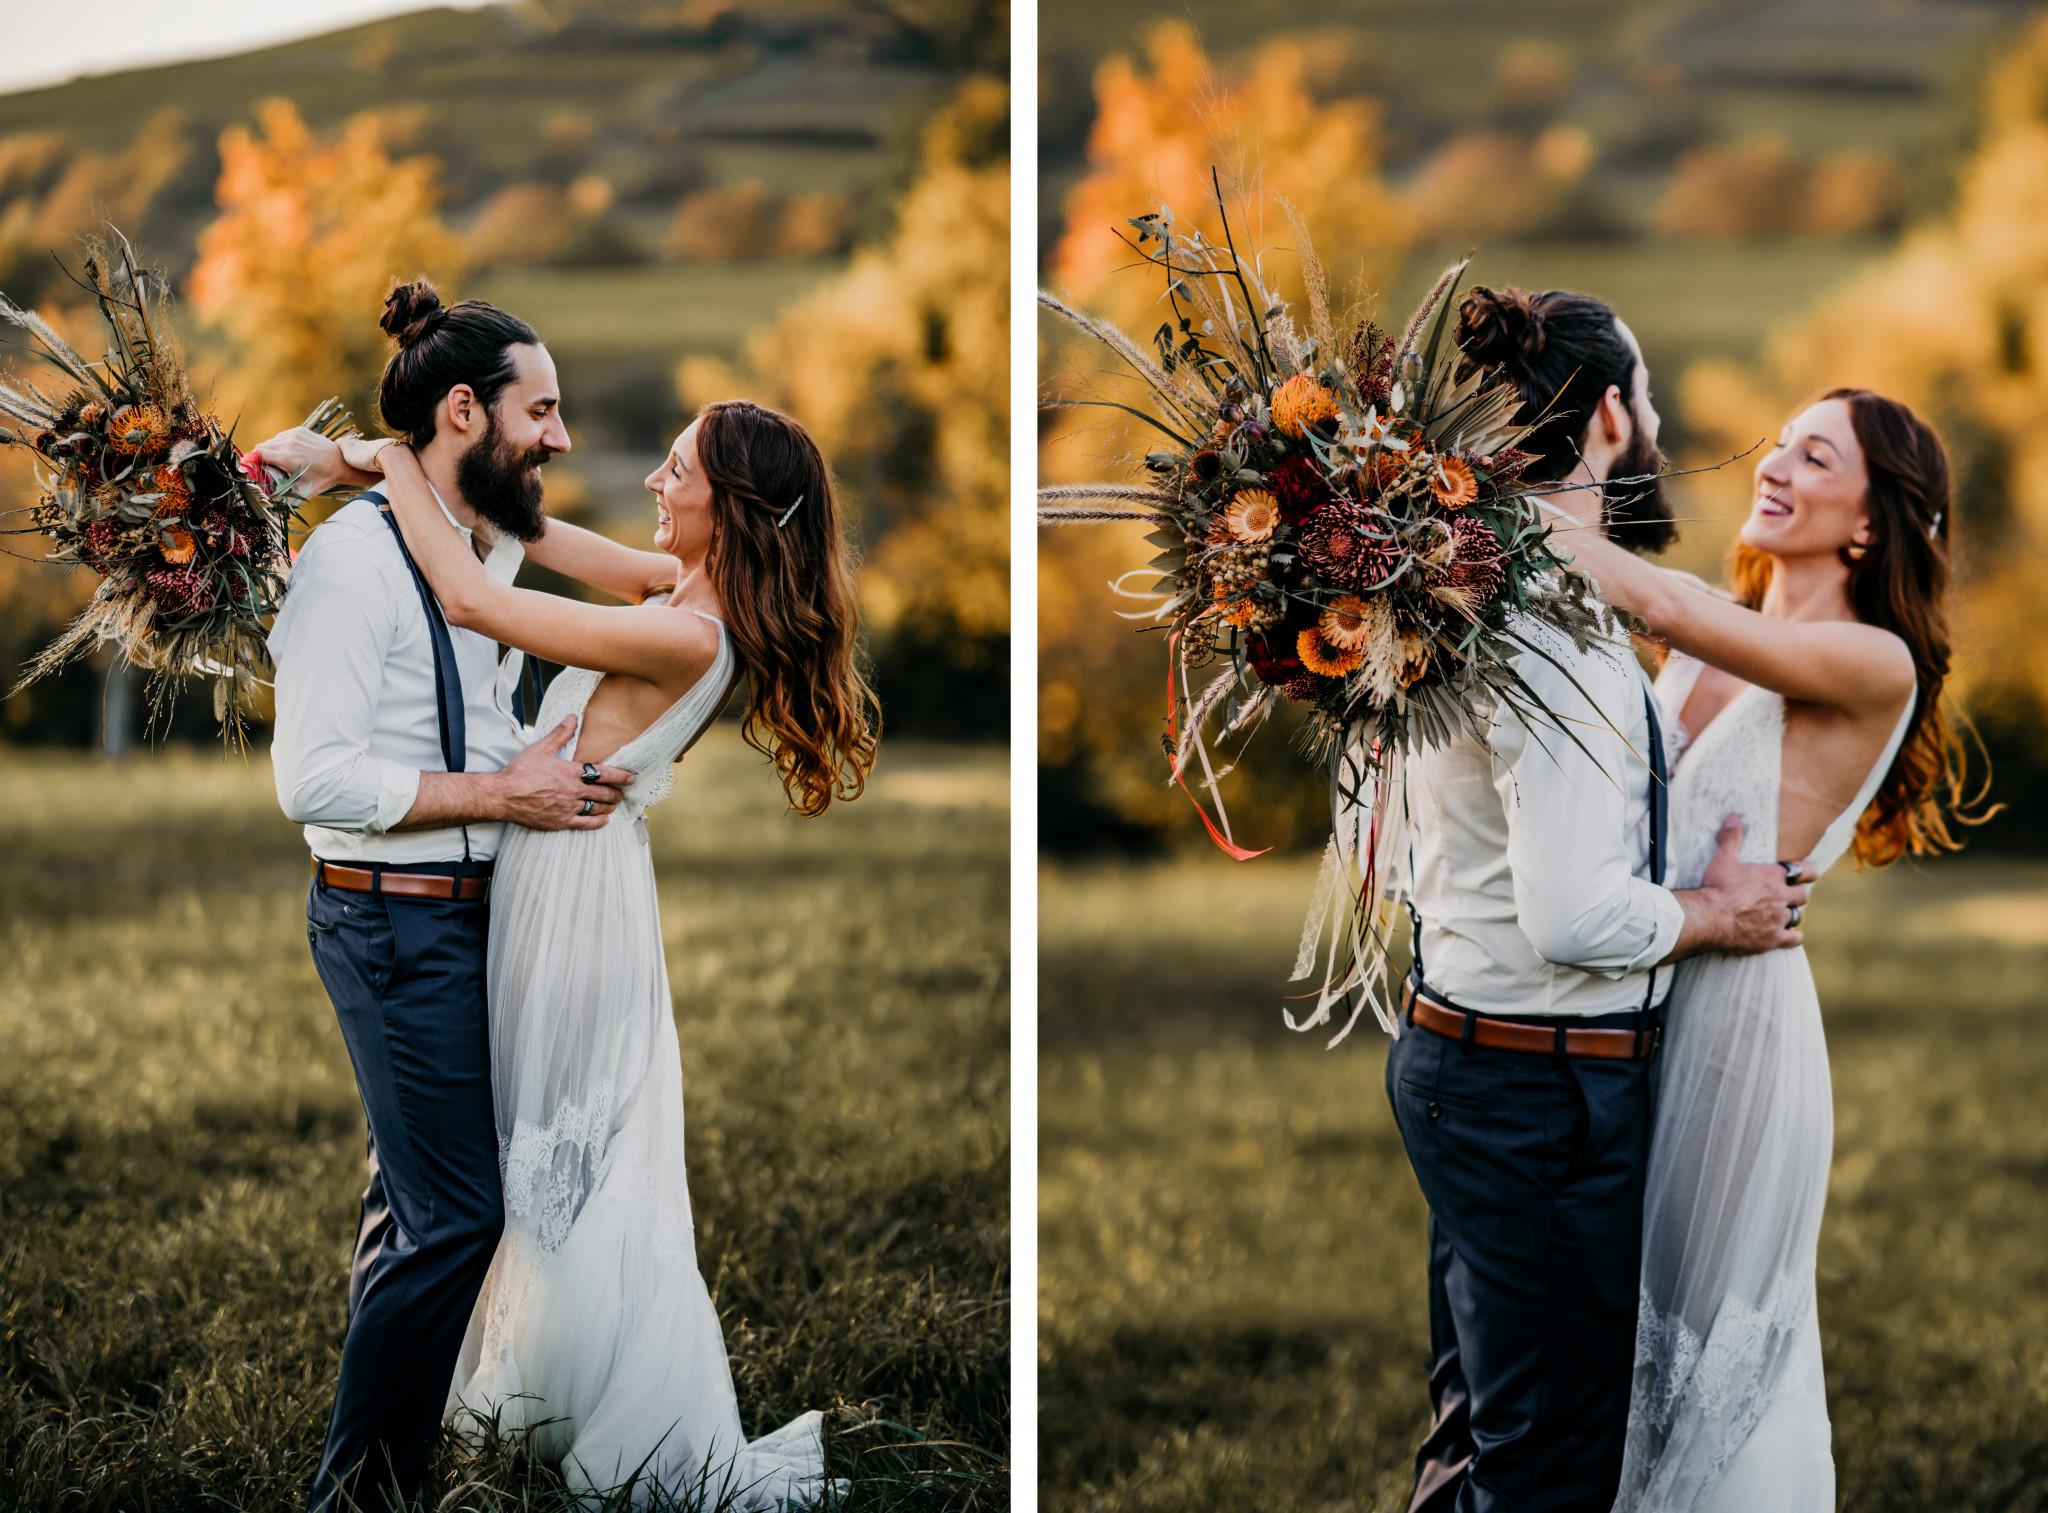 Bohemian After-Wedding-Shooting bei Sonnenuntergang